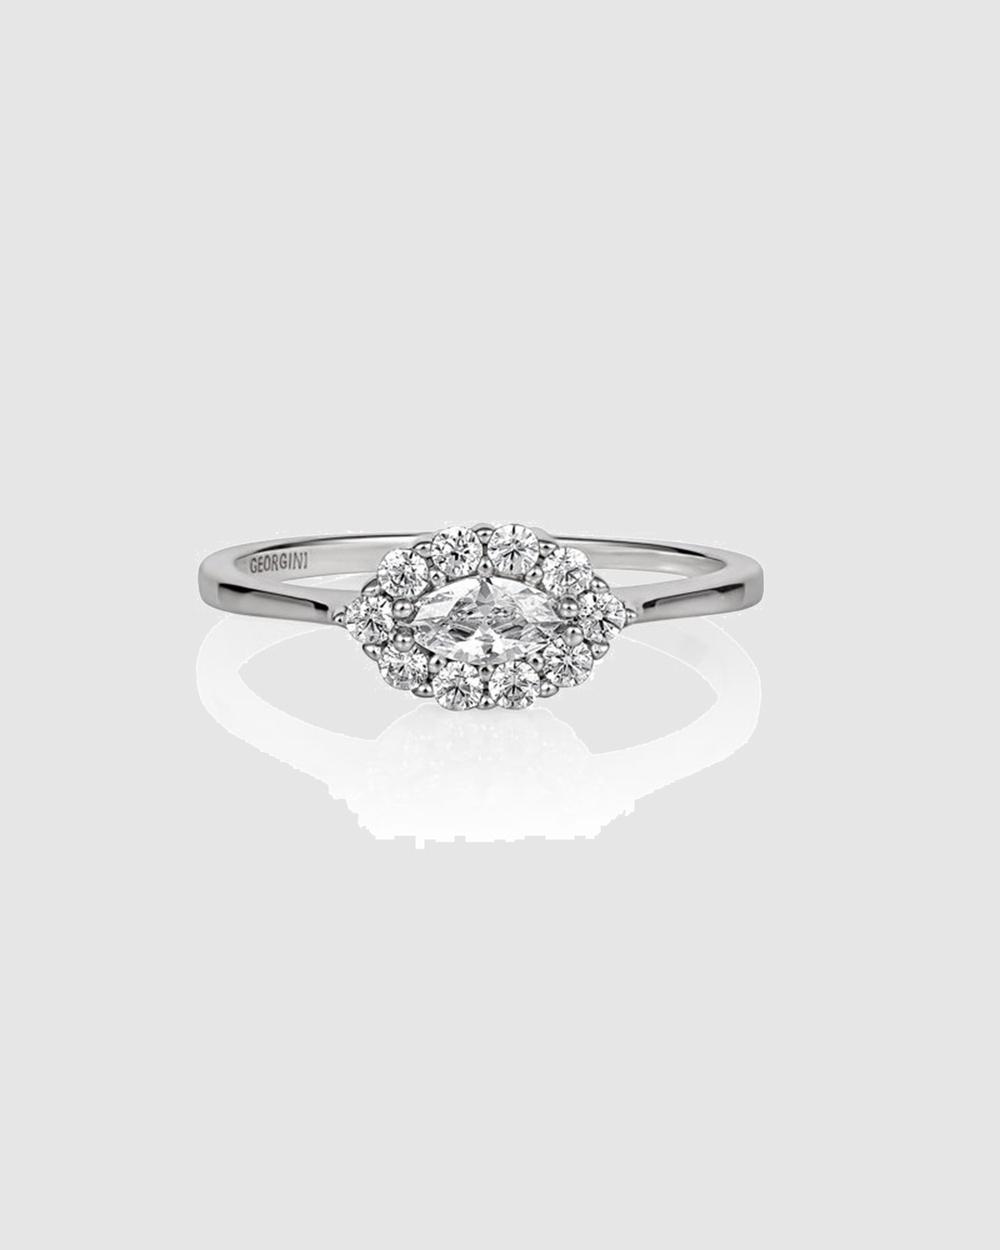 Georgini Heirloom Evermore Ring Jewellery Silver